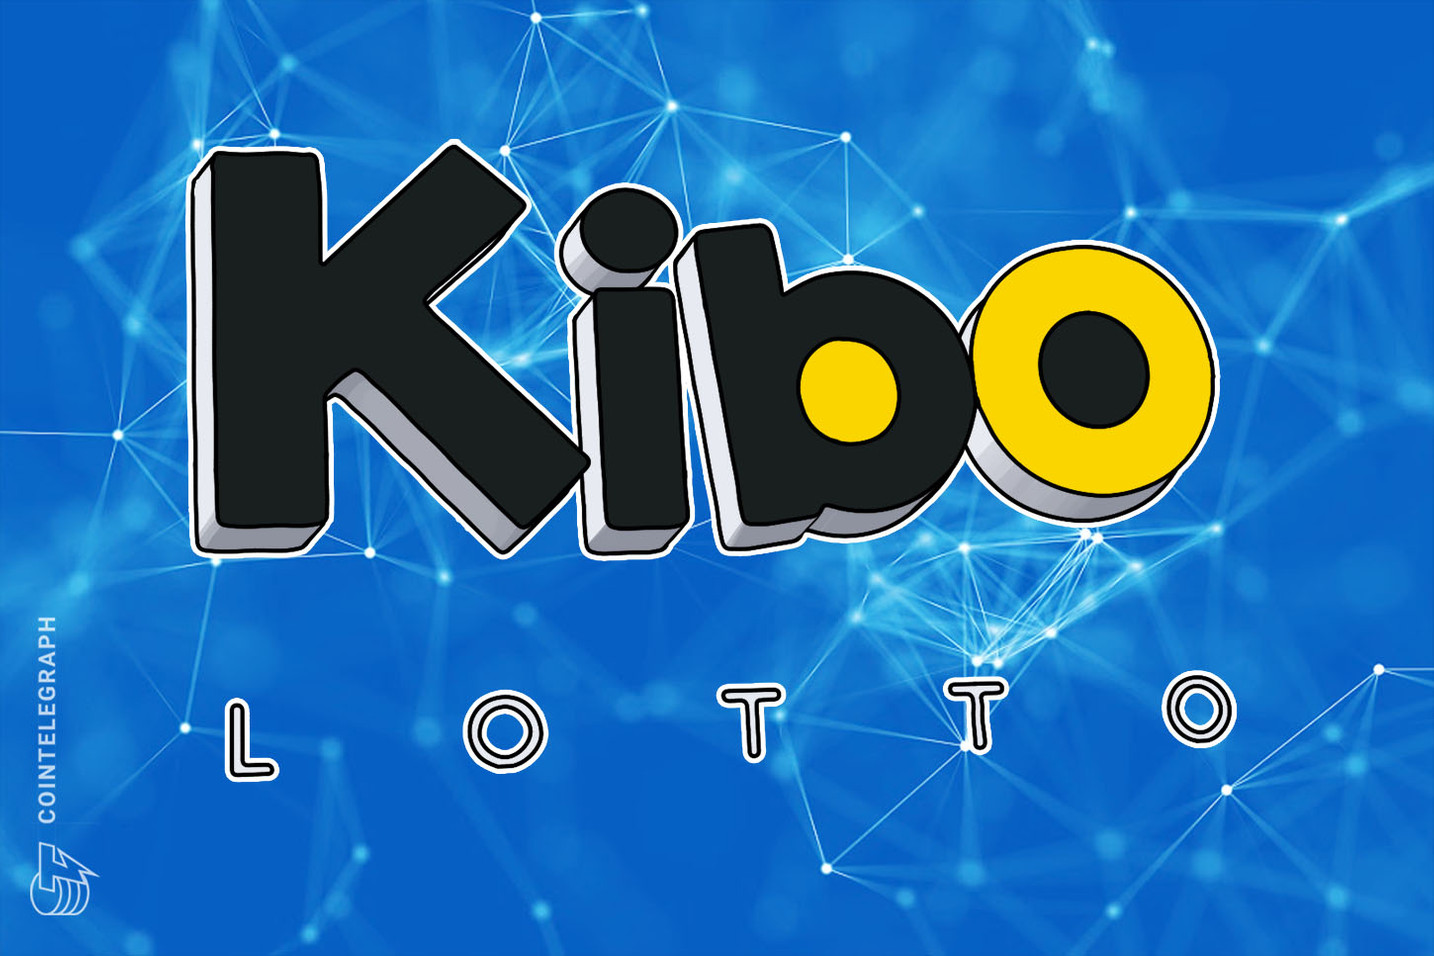 Kibo Lotto erhält Lizenz in Curaçao